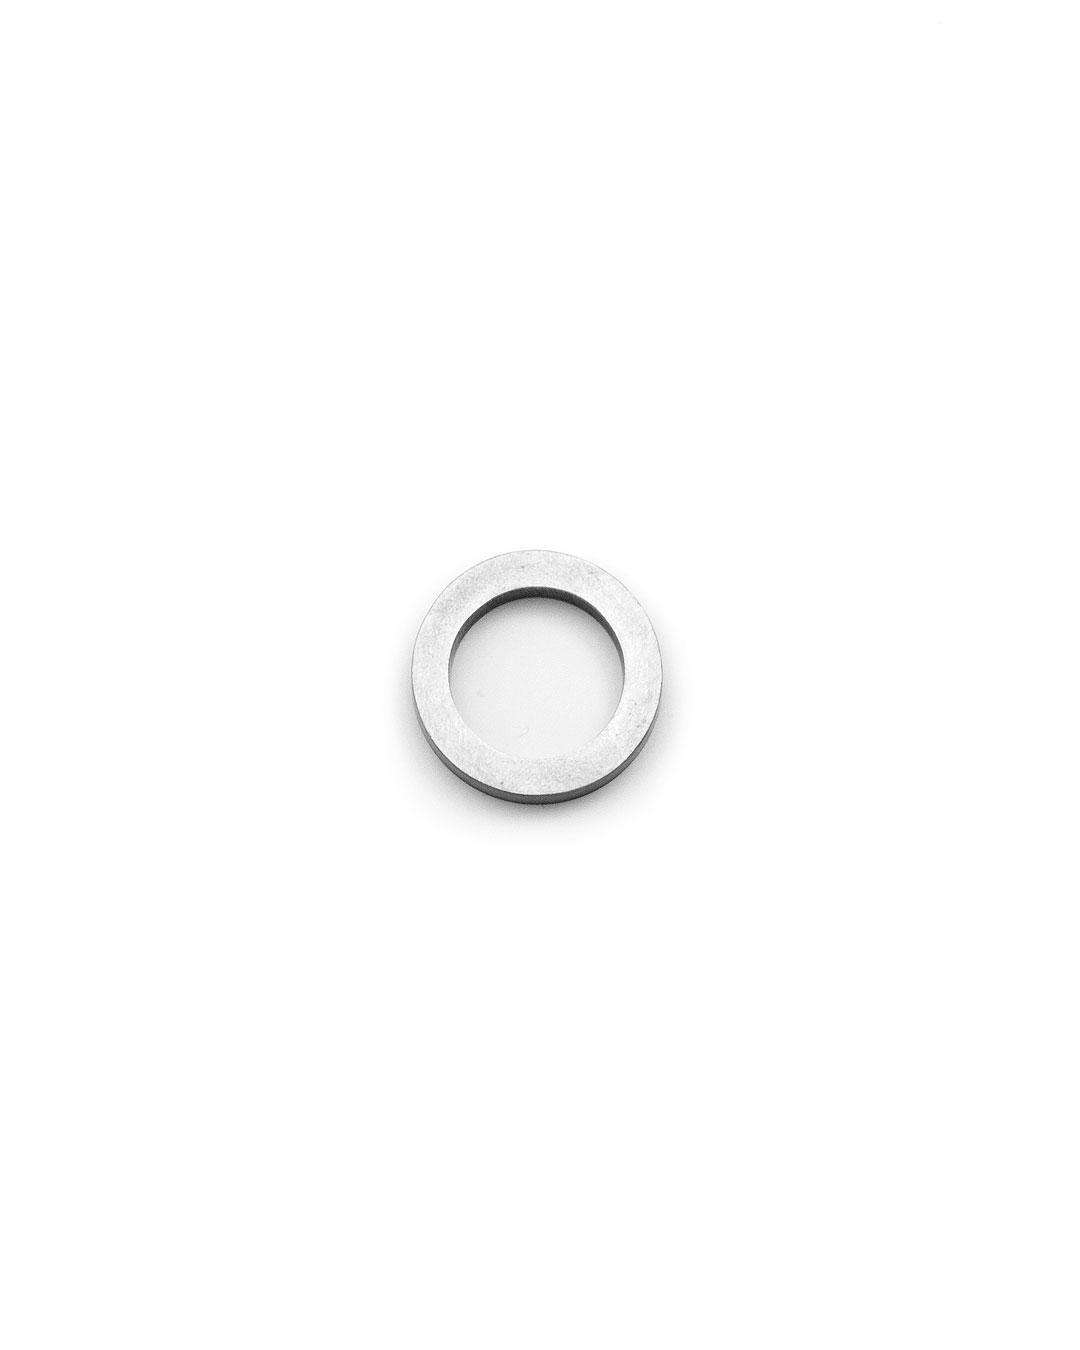 Junwon Jung, untitled, 2015, ring; titan zinc, silver, ø 28 x 5 mm, €610